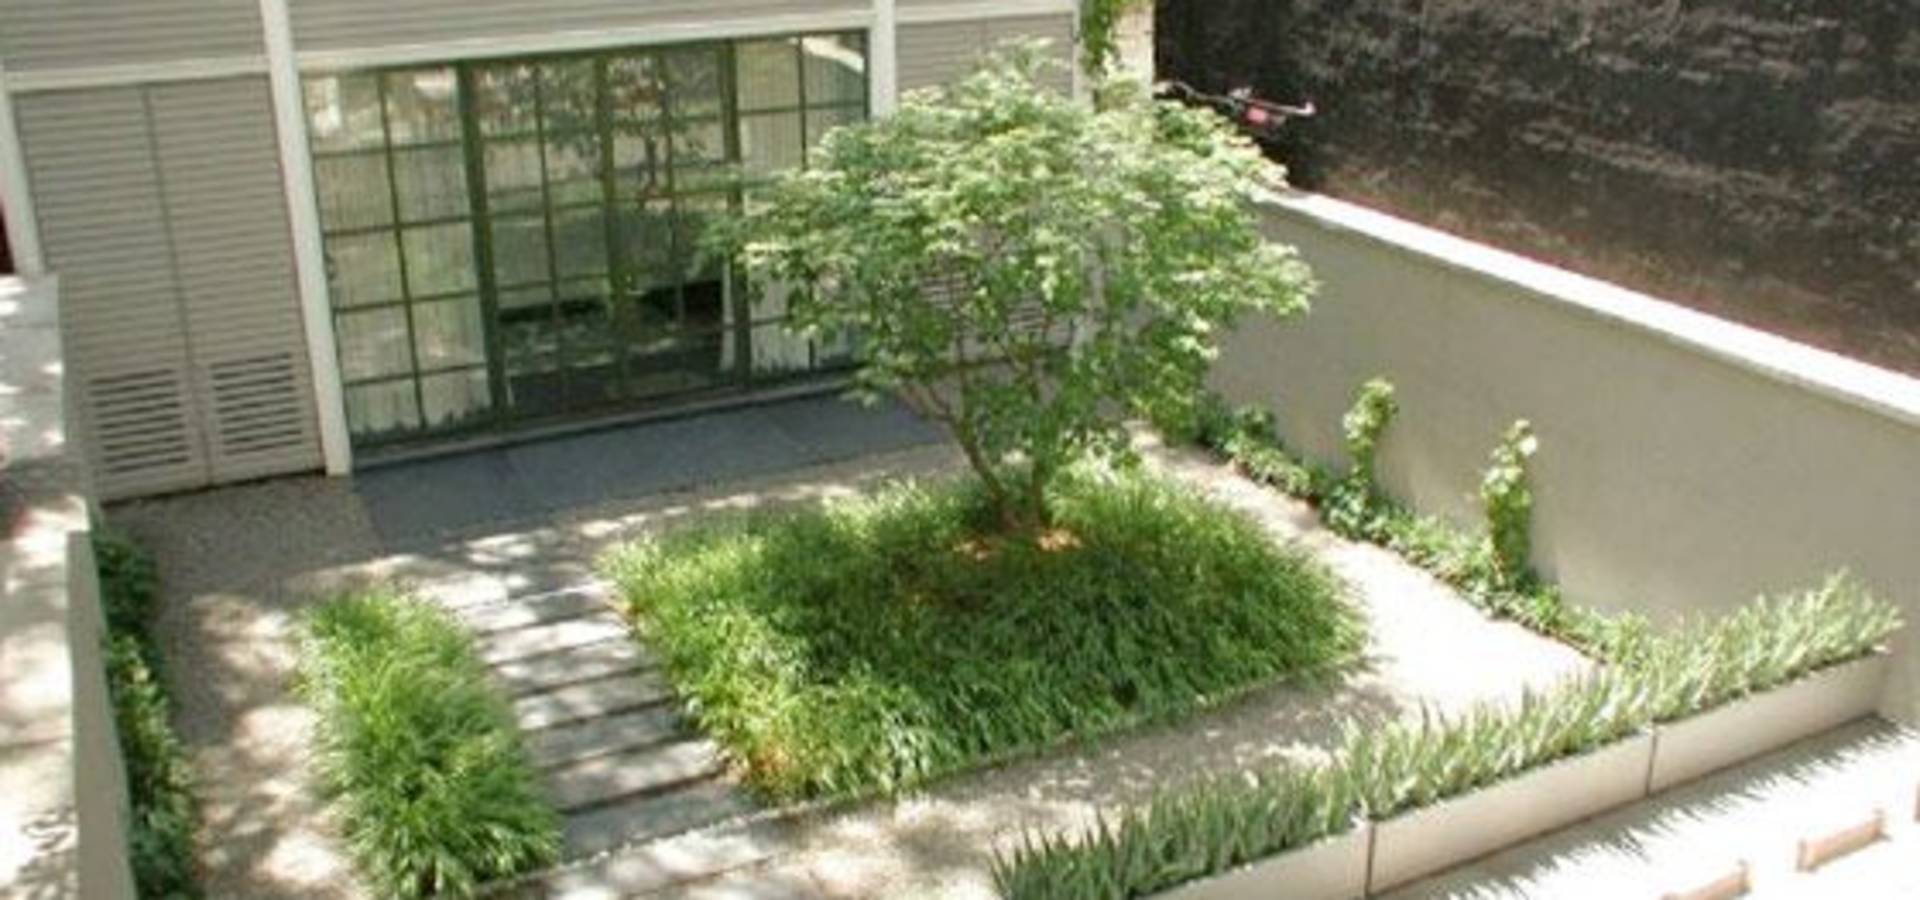 Adezz poland art culos de jardiner a en ma a nieszawka for Articulos de jardineria